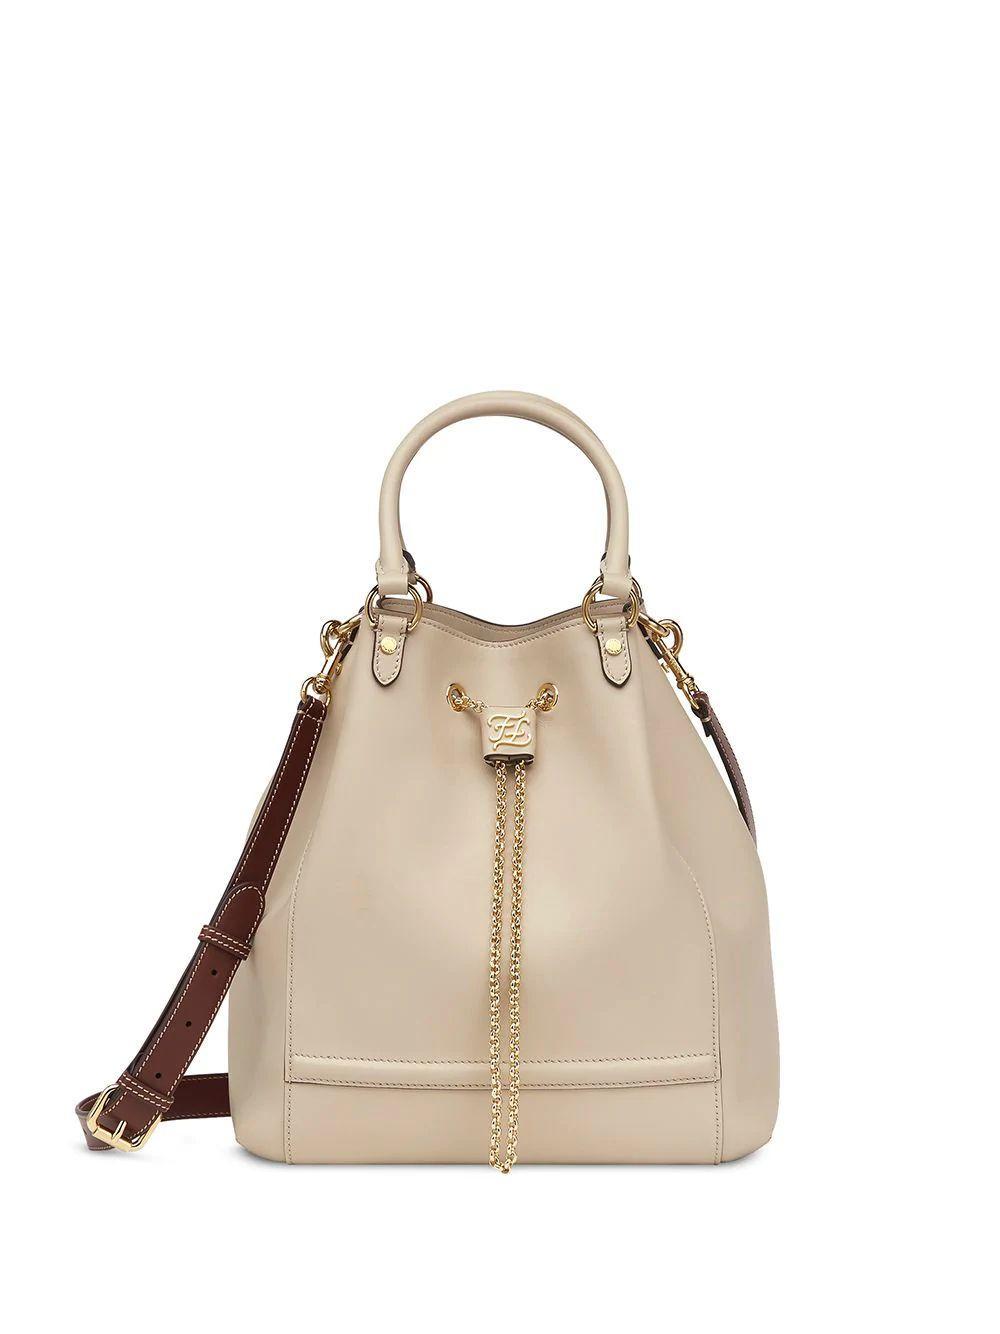 Double Carry Bucket Bag Item # 8BT322-AAJ1